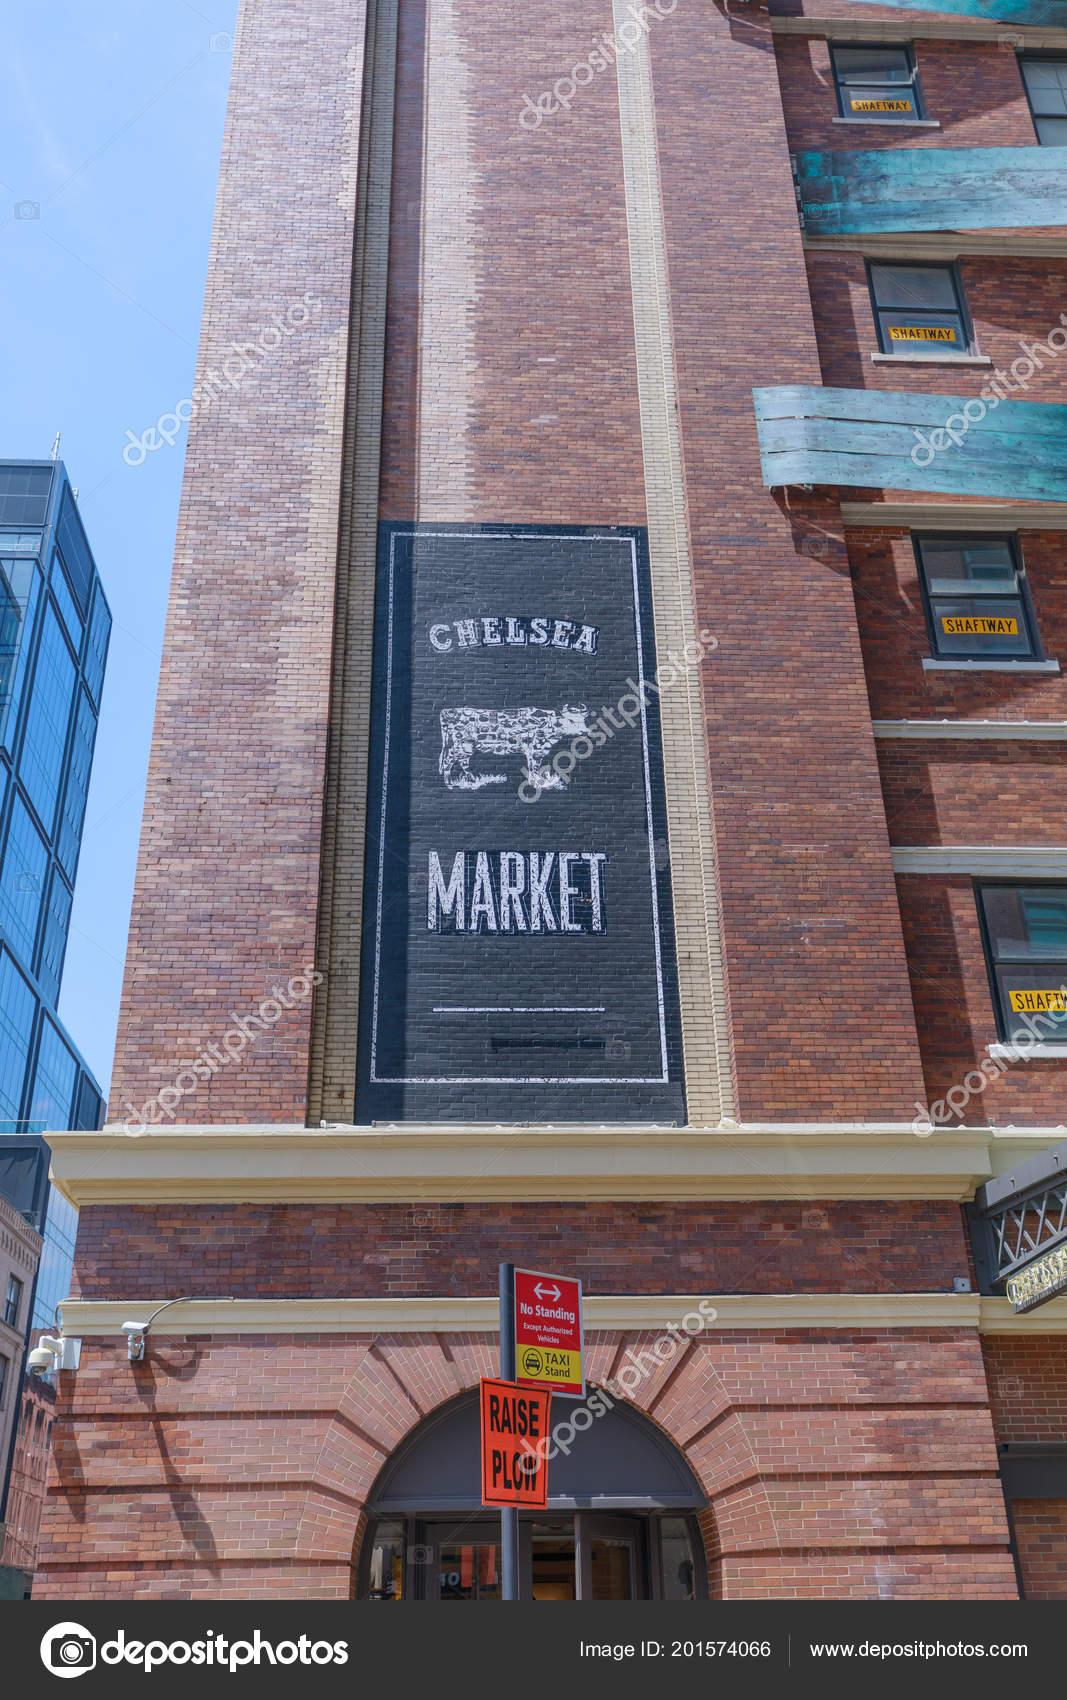 Manhattan New York City May 2018 Nyc Landmark Chelsea Market – Stock